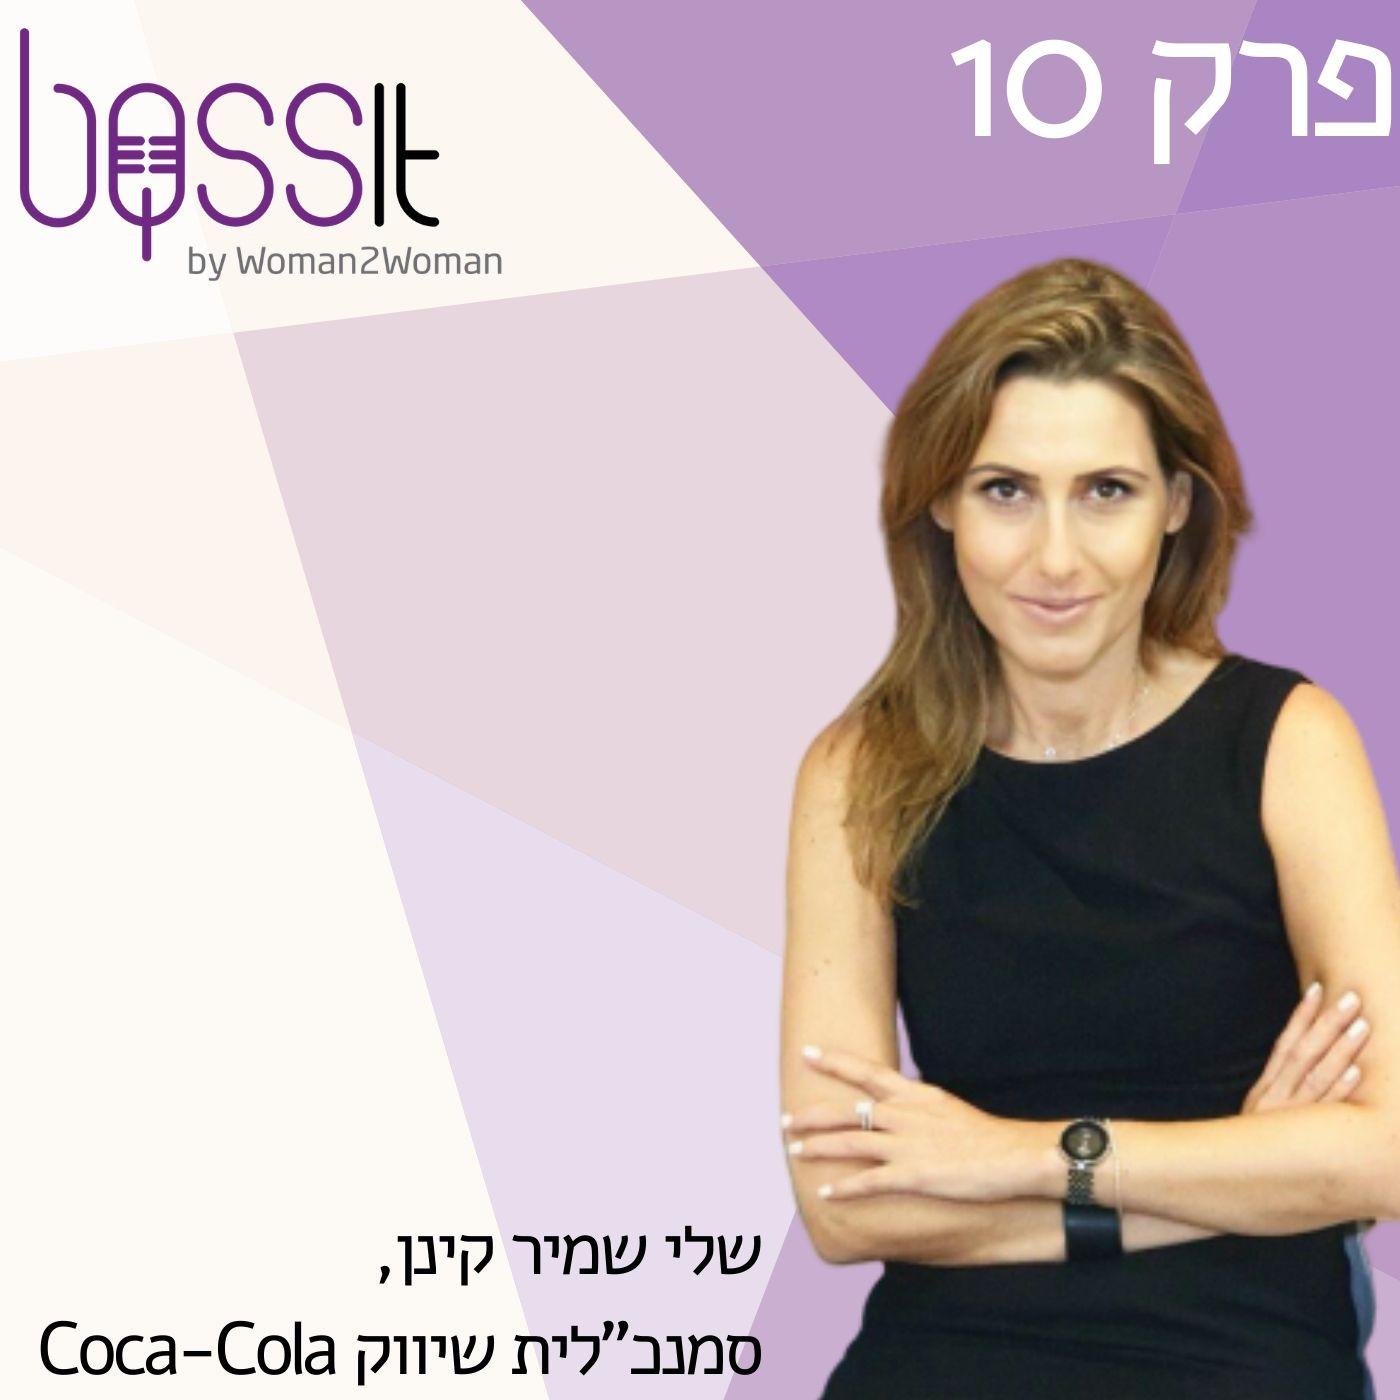 Bossit – פרק 10: שיוויון הזדמנויות וחדשנות בשיווק עם שלי שמיר קינן